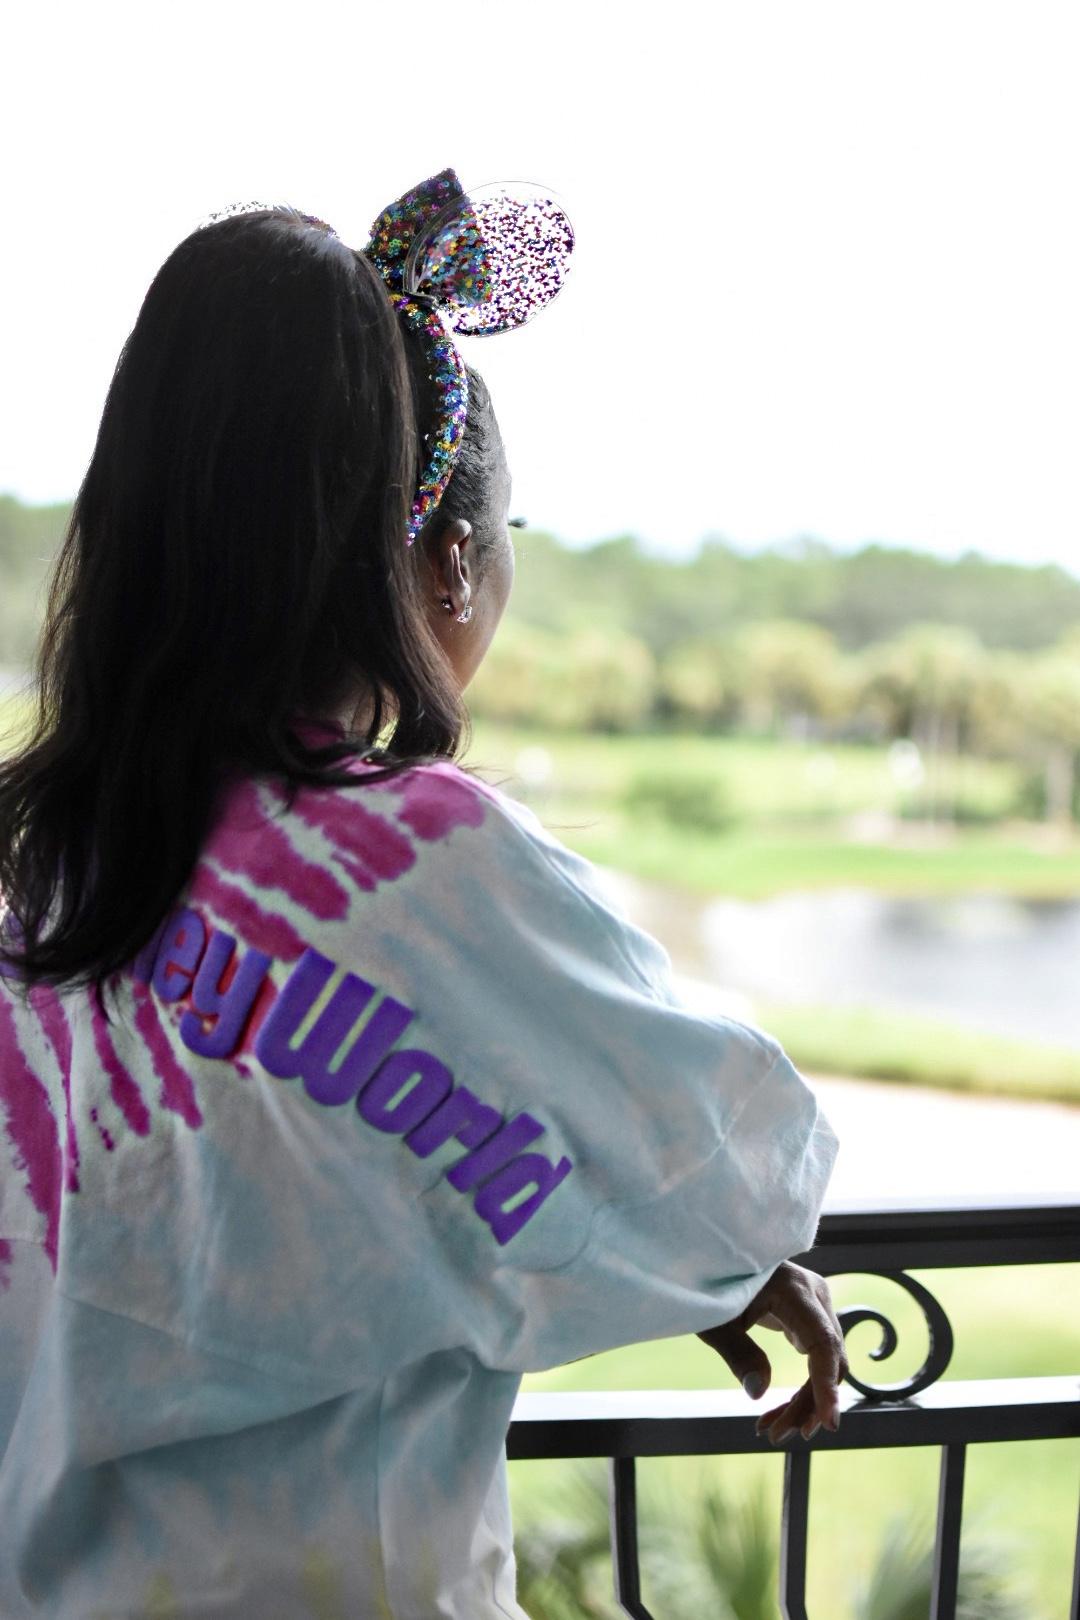 My Style: Disneyland Tie-Dye Spirit Jersey